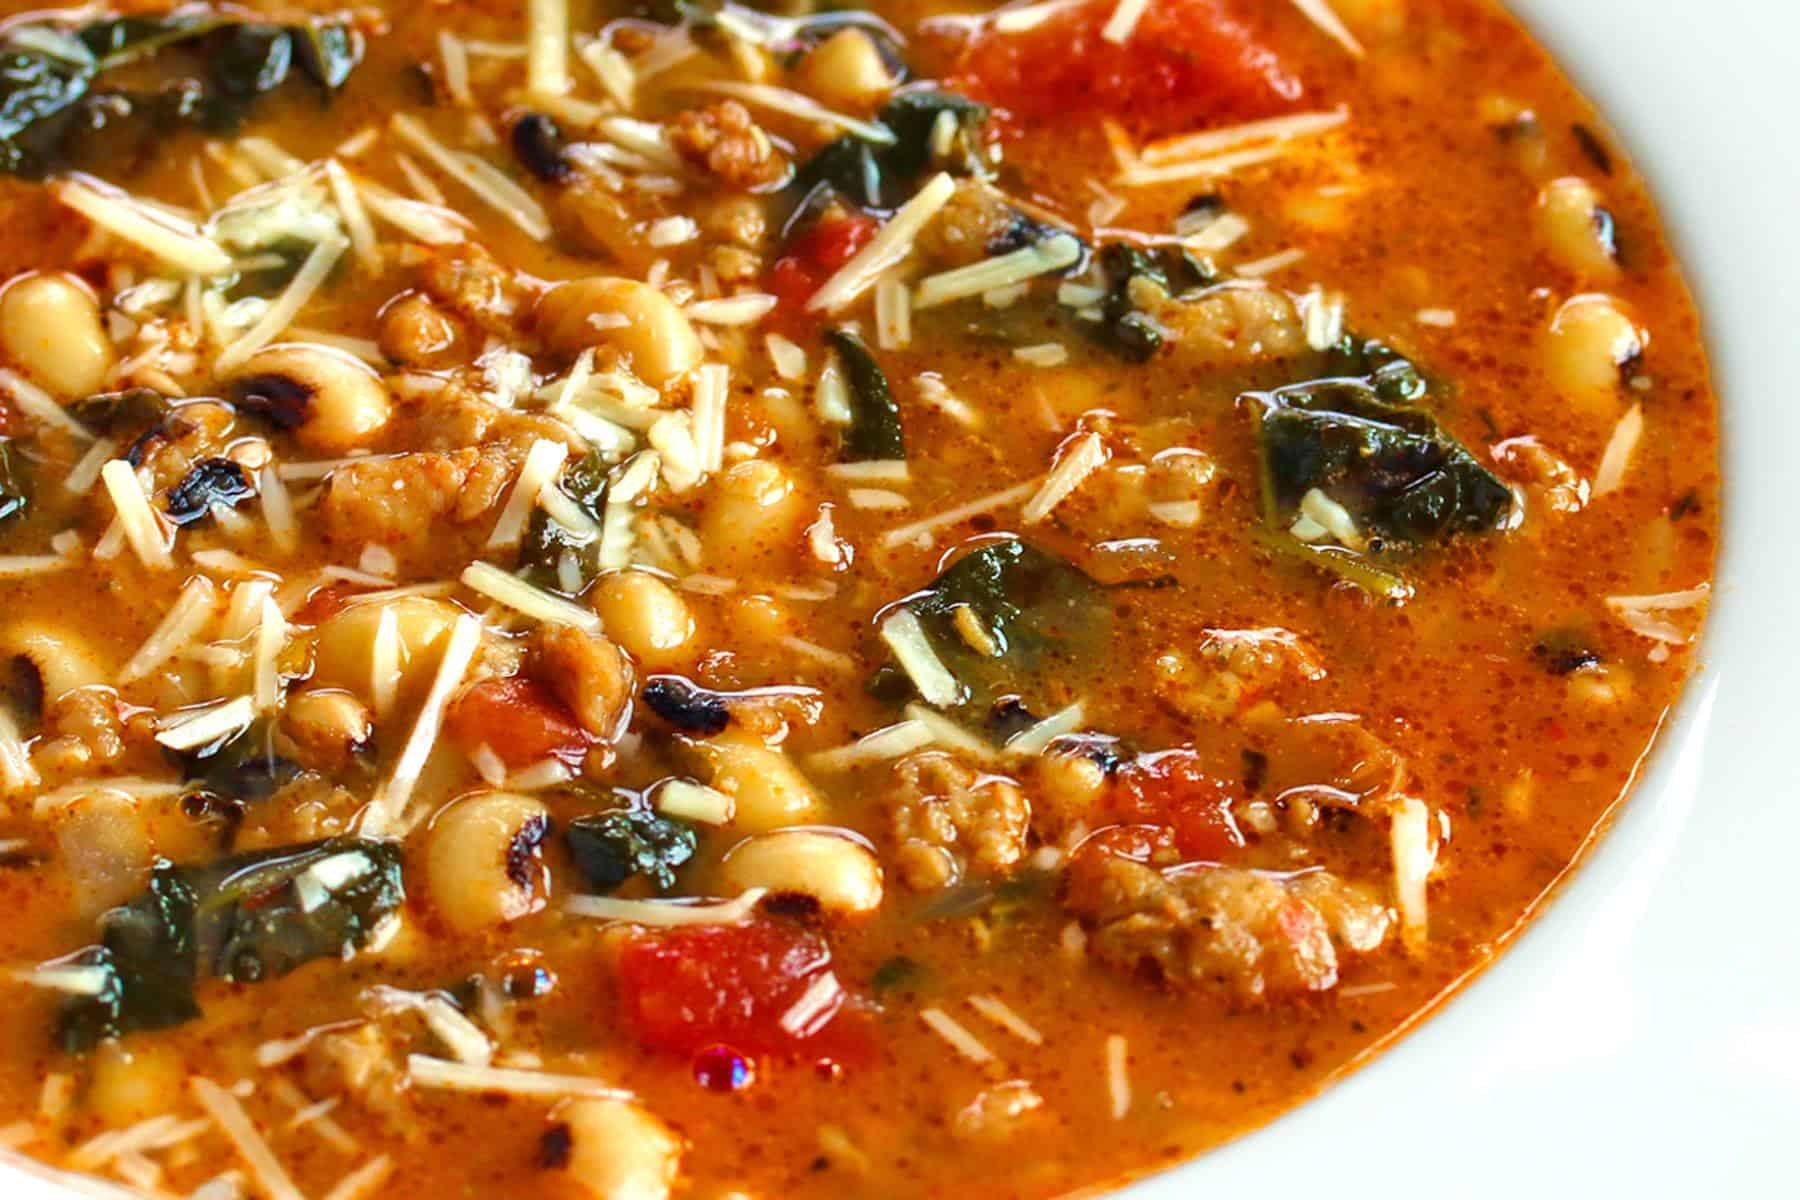 black eyed peas soup sausage kale recipe southern healthy gluten free